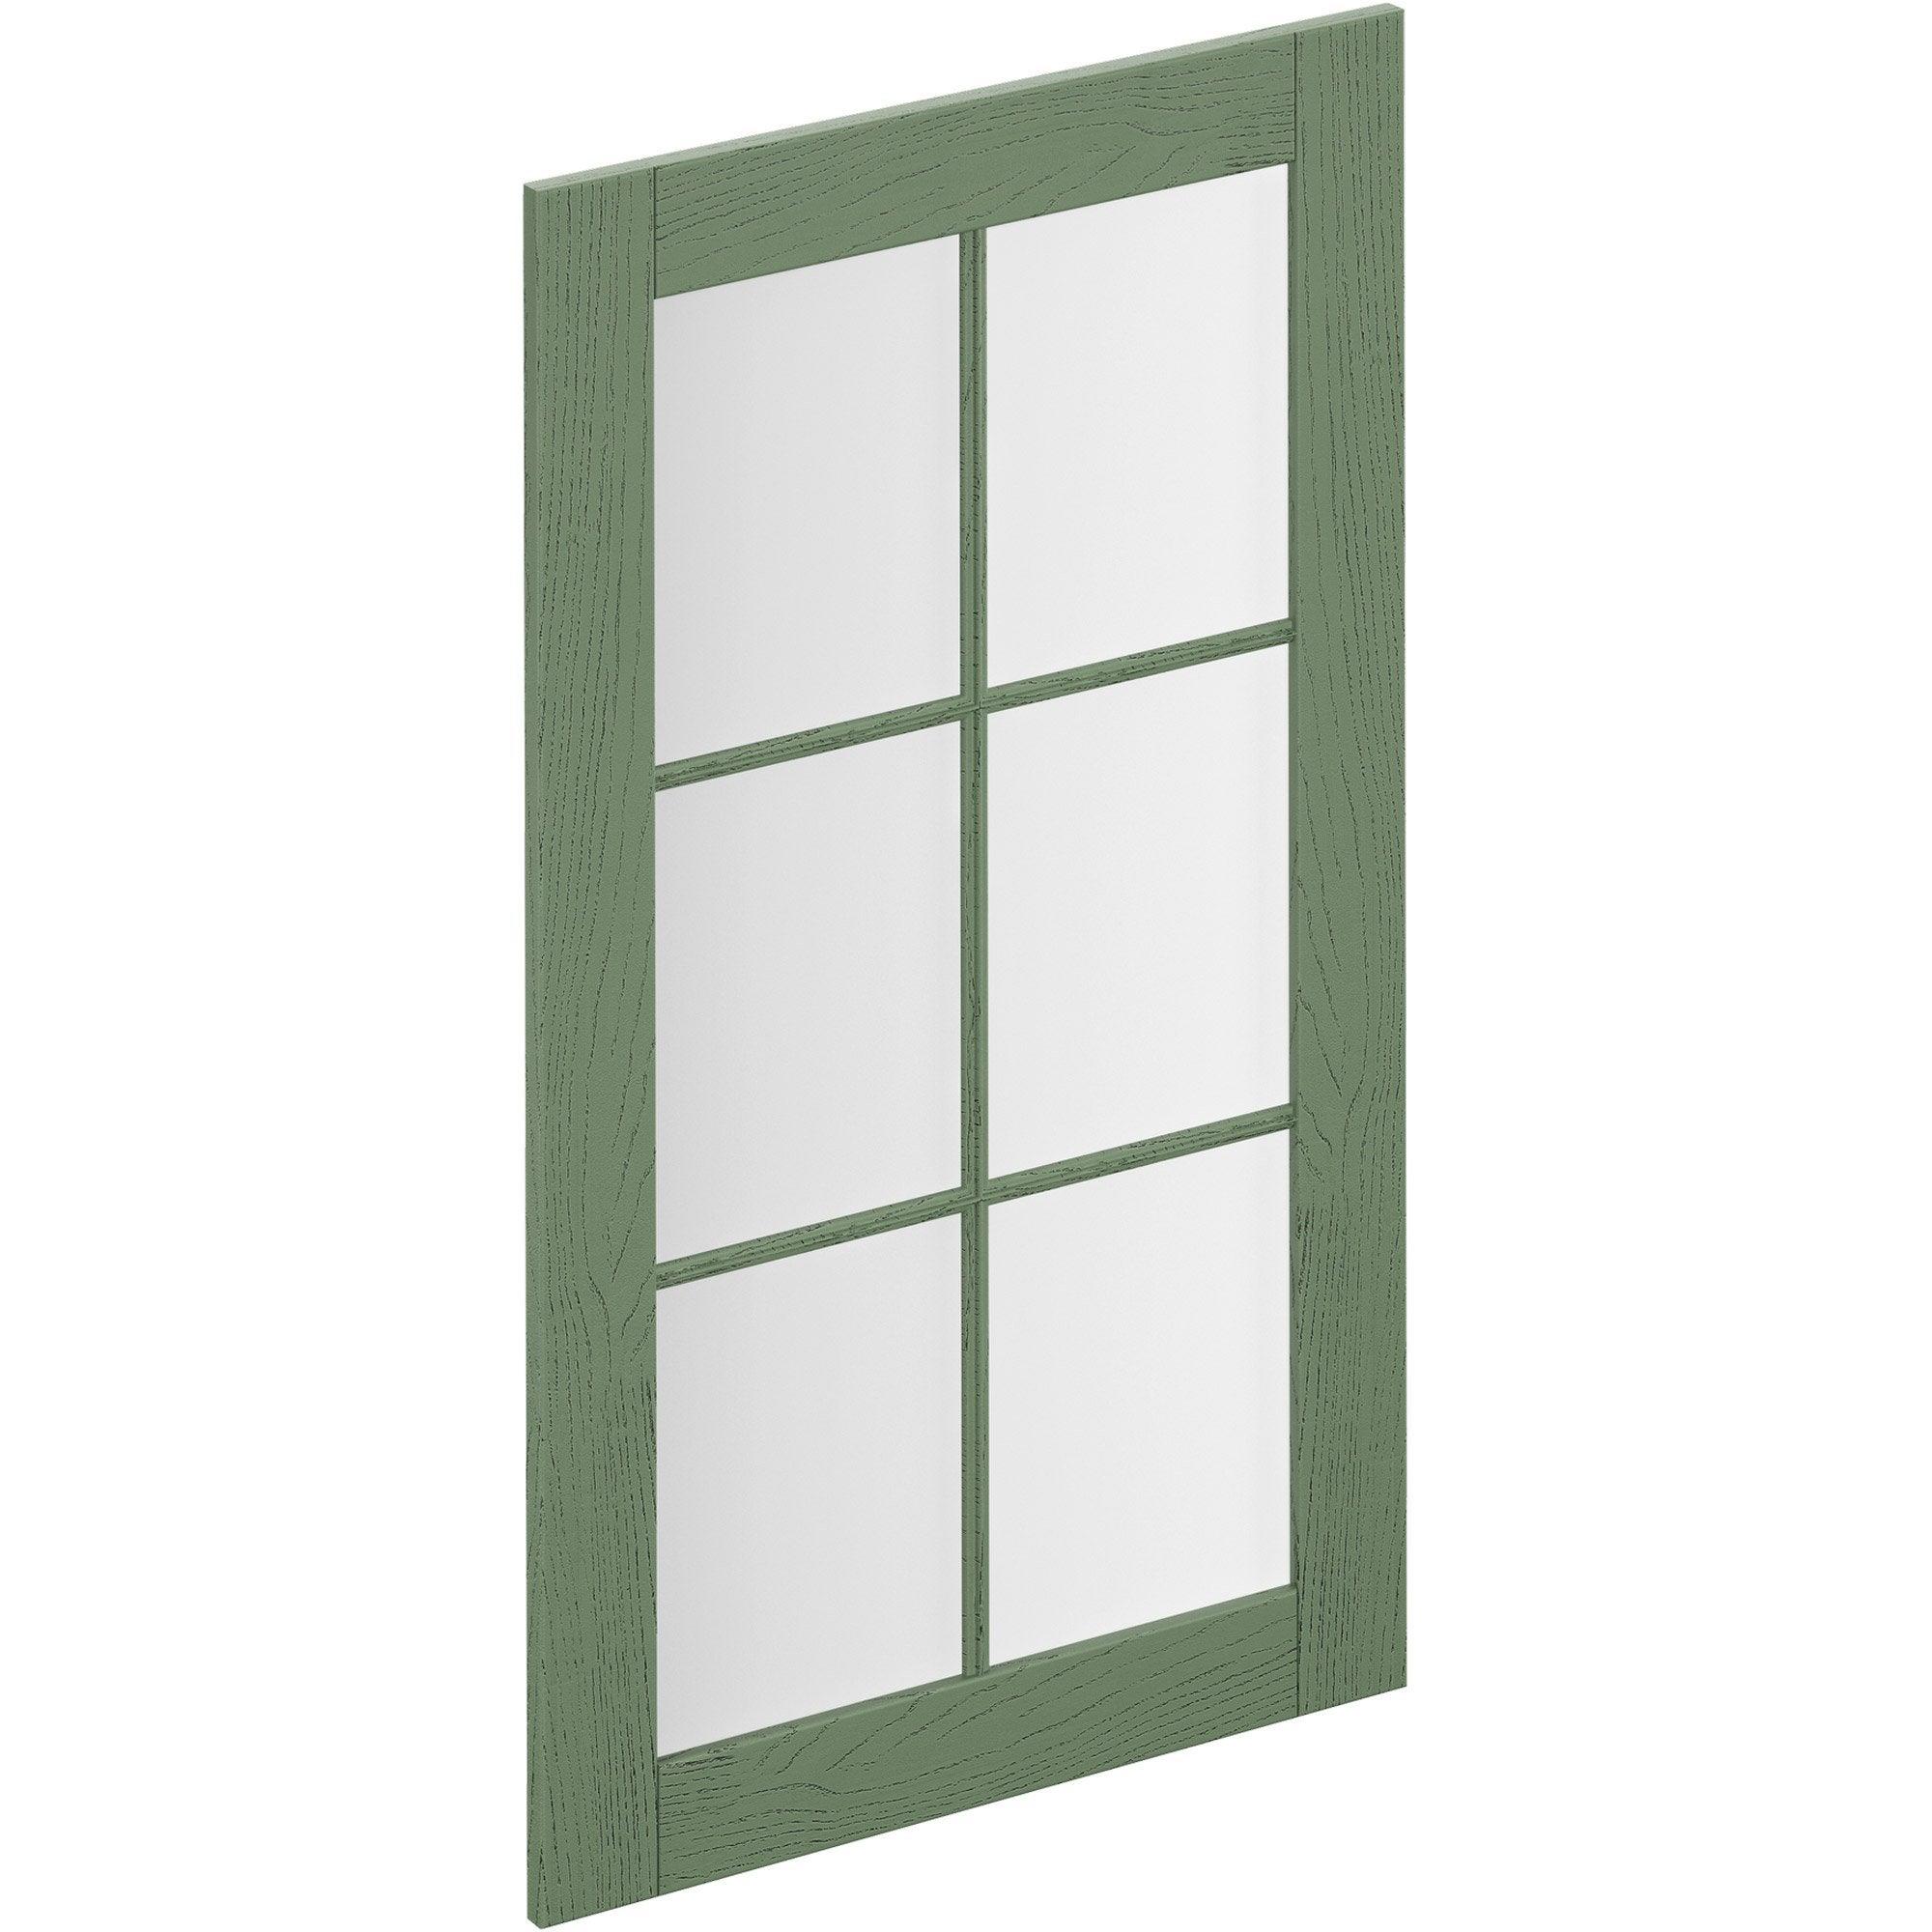 Porte de cuisine vitr e chicago vert delinia id x cm leroy merlin - Porte de cuisine vitree ...